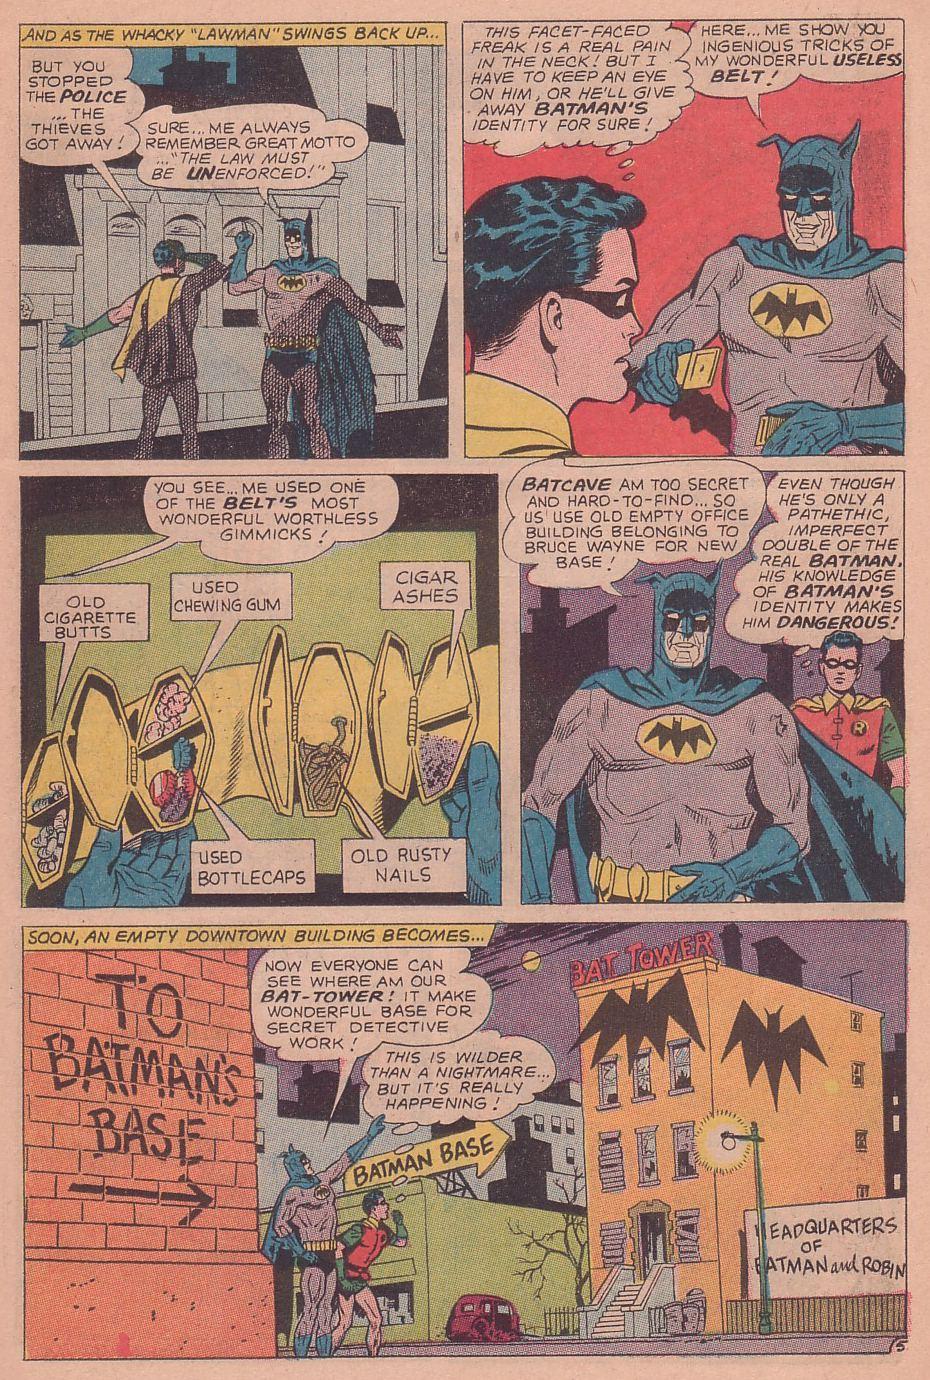 Read online World's Finest Comics comic -  Issue #156 - 7